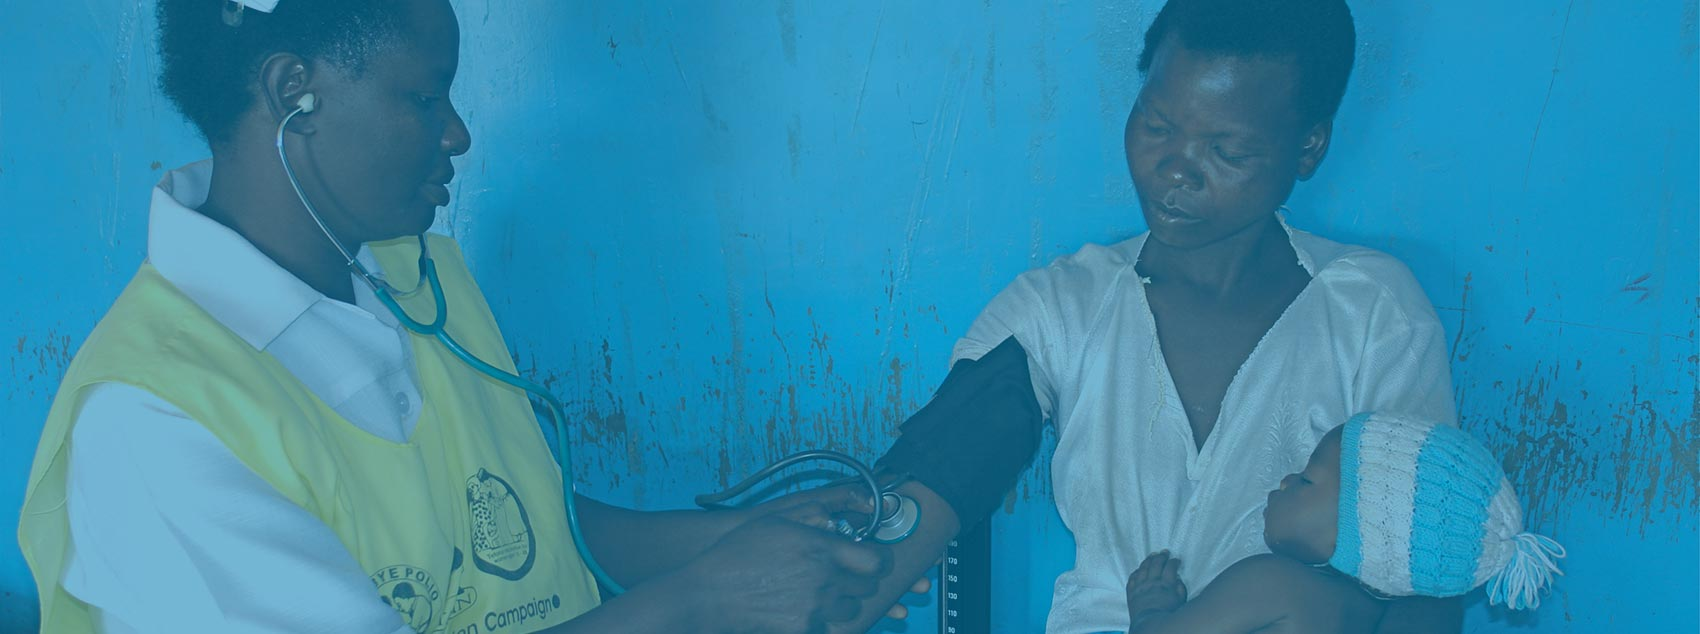 Zambian nurse takes mother's blood pressure